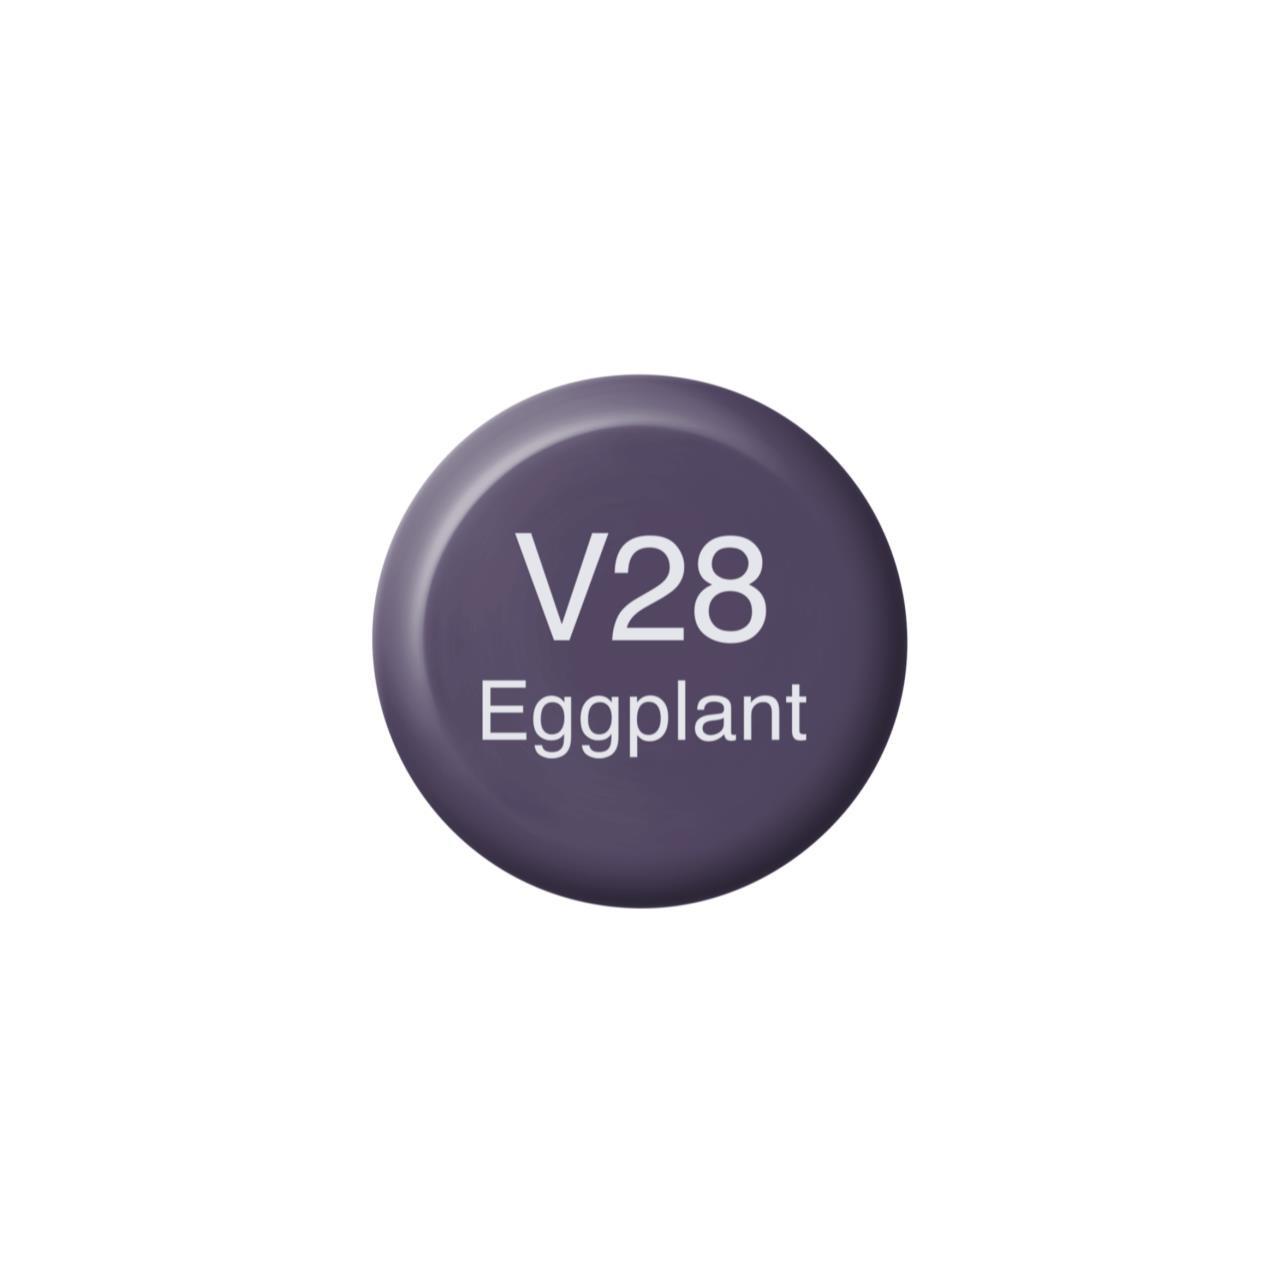 V28 Eggplant, Copic Ink - 4511338058084